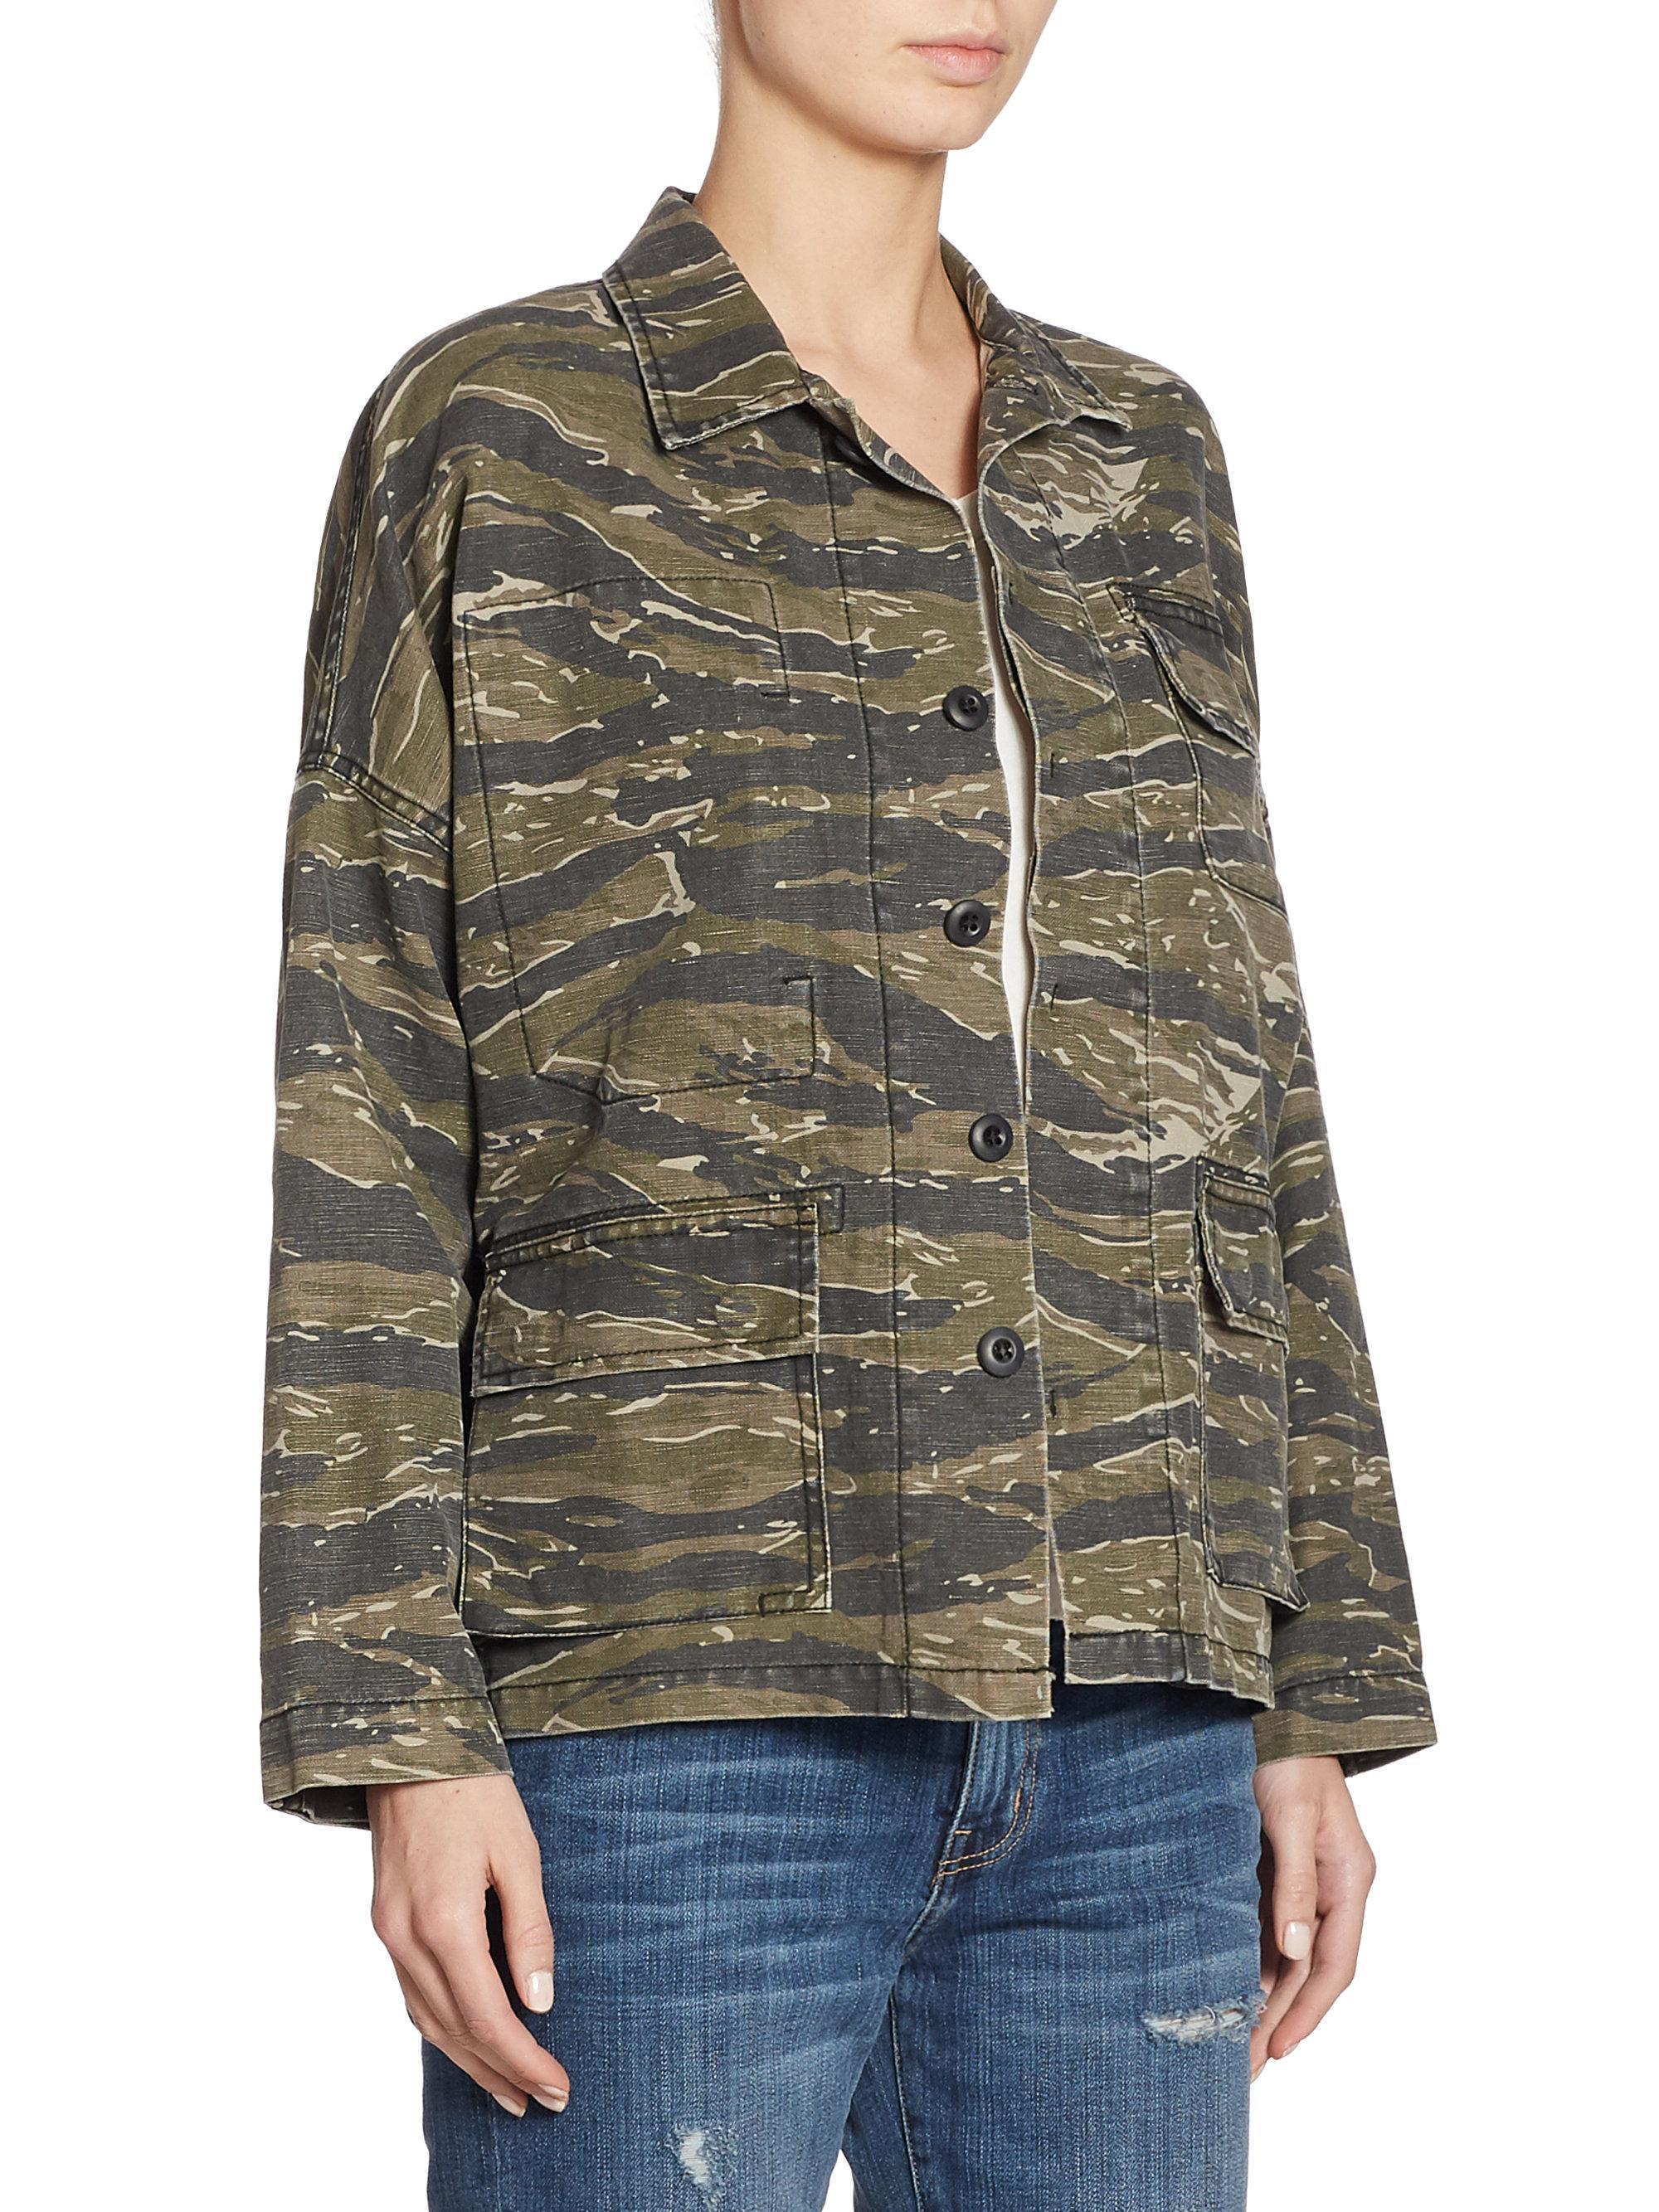 Lyst Current Elliott Camo Army Jacket